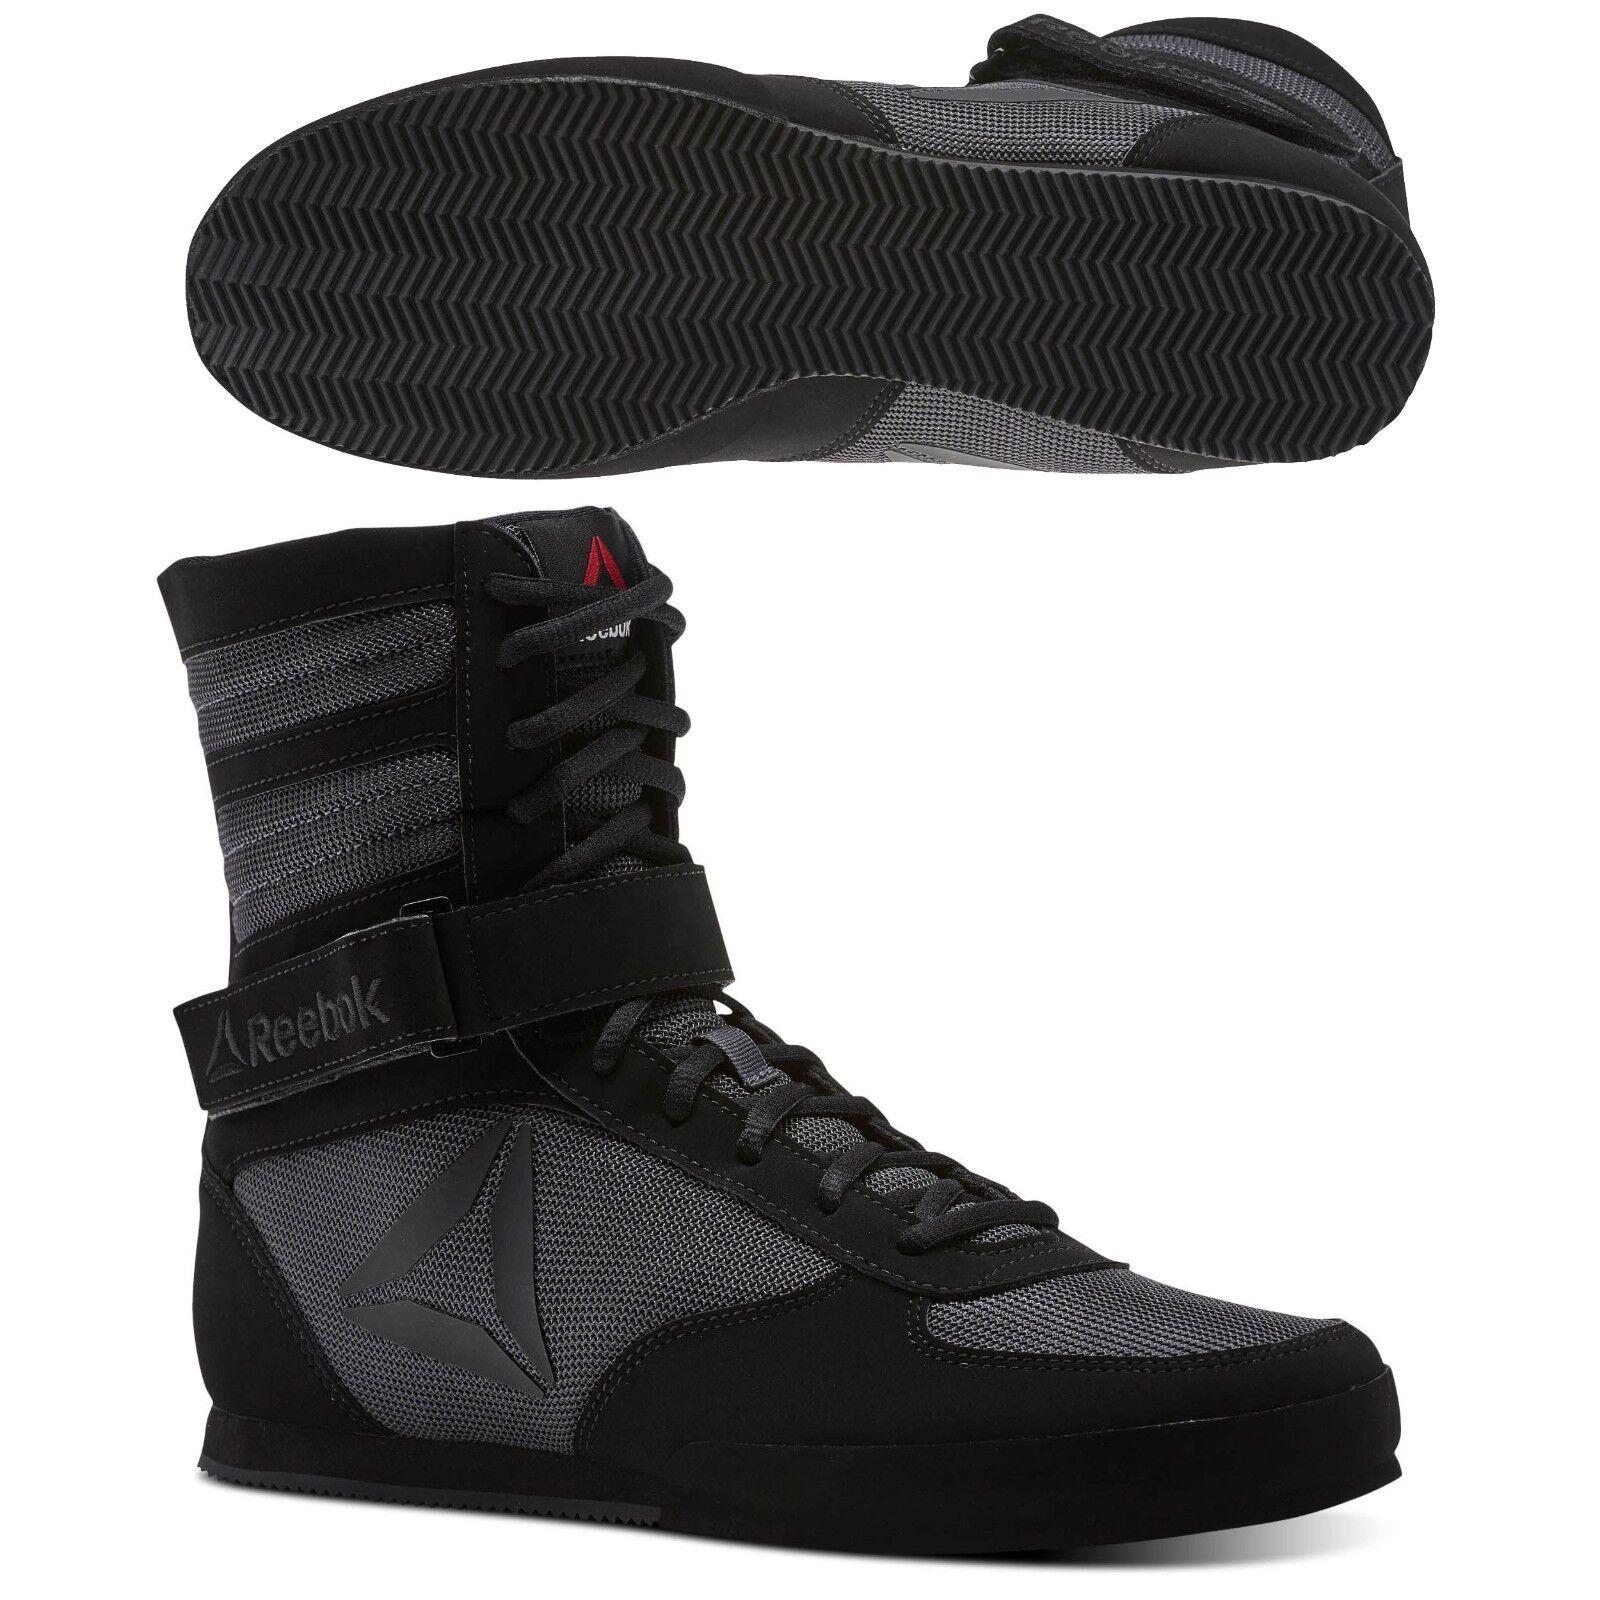 REEBOK BOXING Stiefel CN0977 (UFC + BOX )